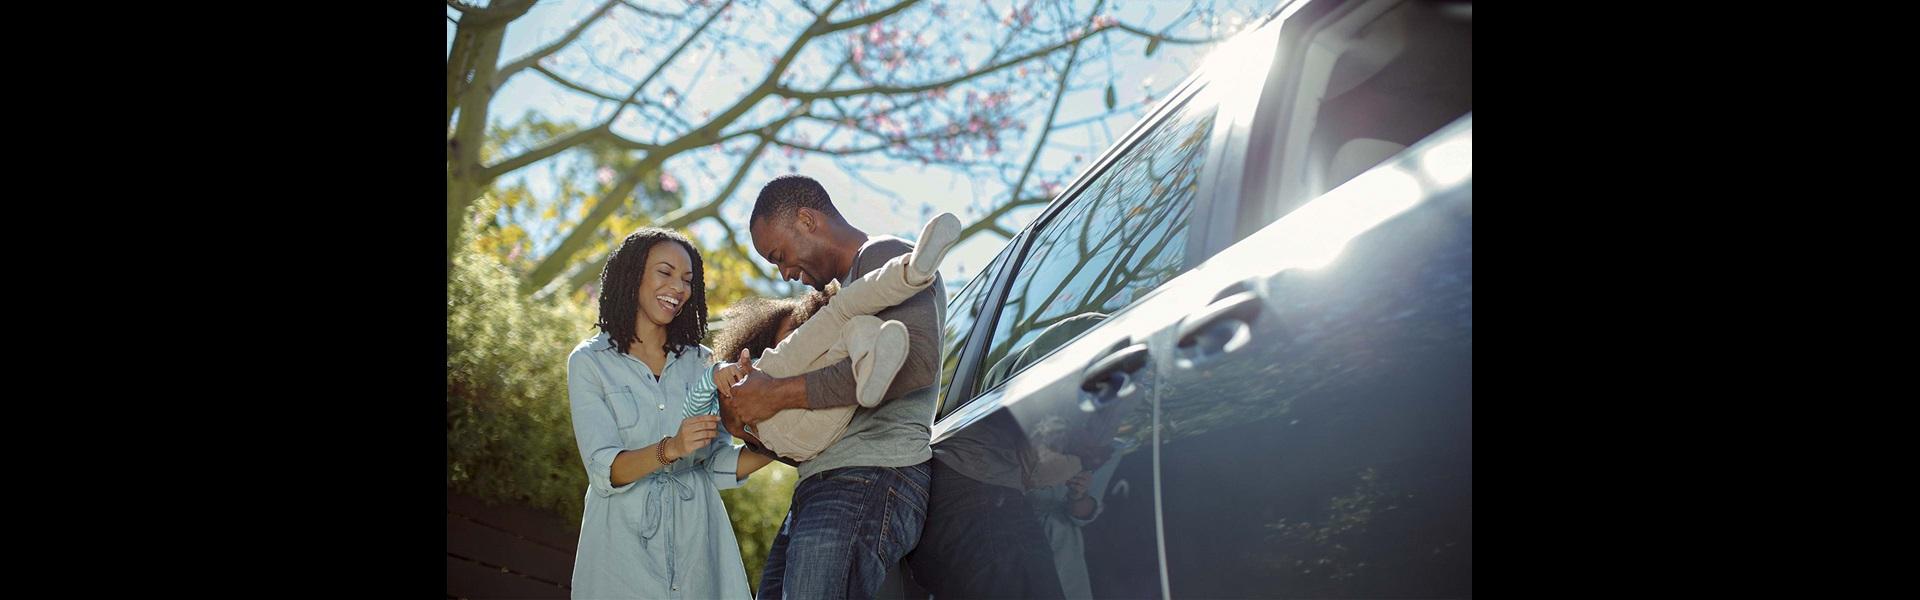 Auto Insurance | NJM